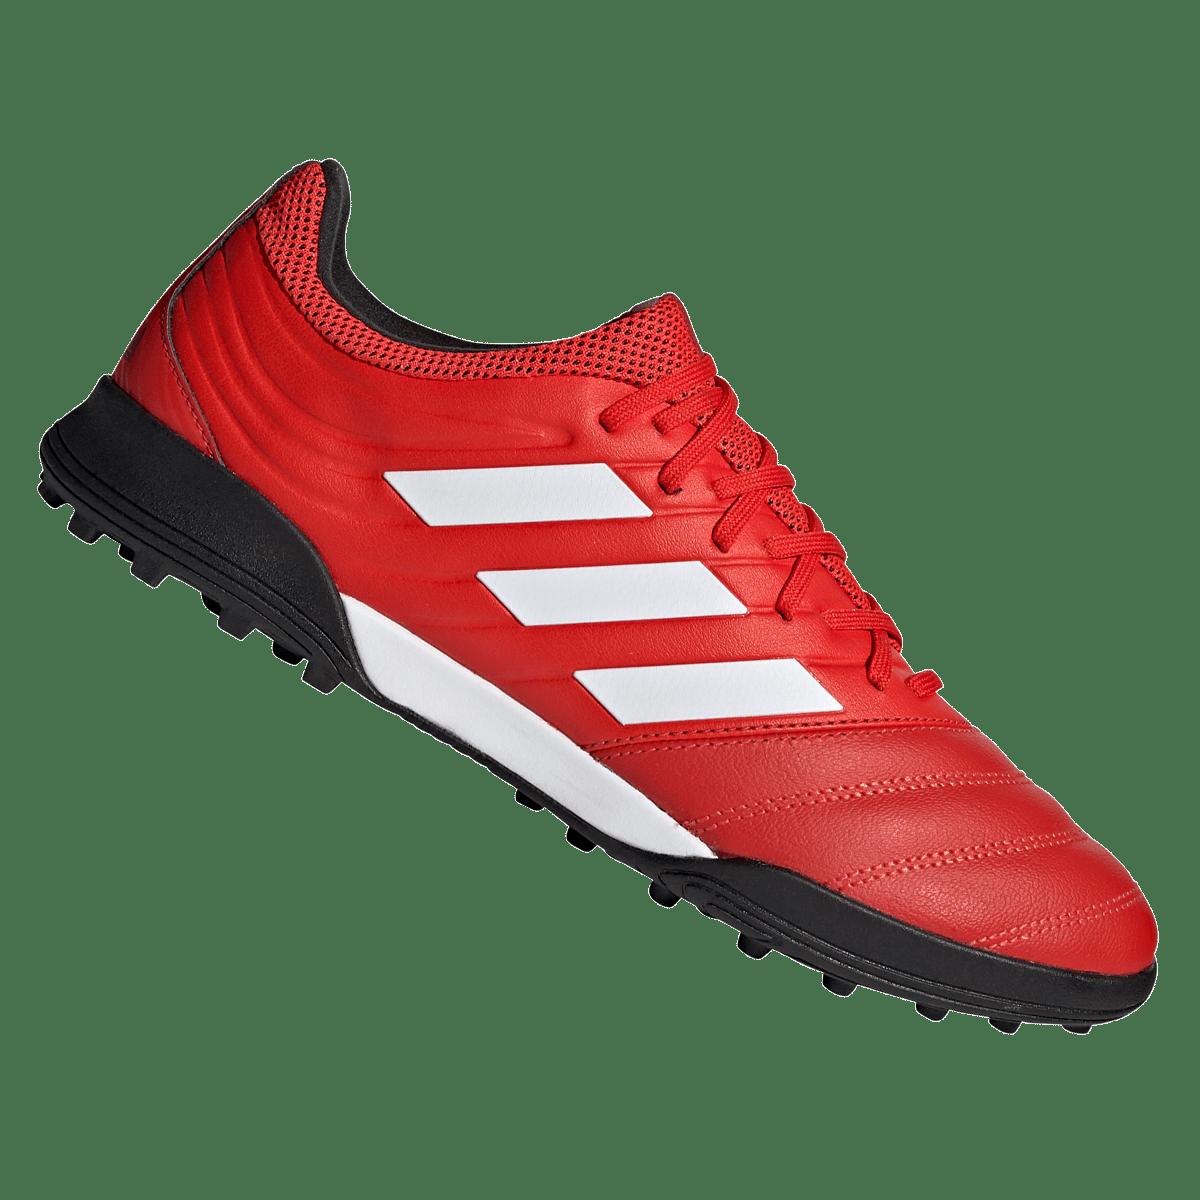 adidas Fußballschuh Copa 20.3 TF Kunstrasen rotschwarz